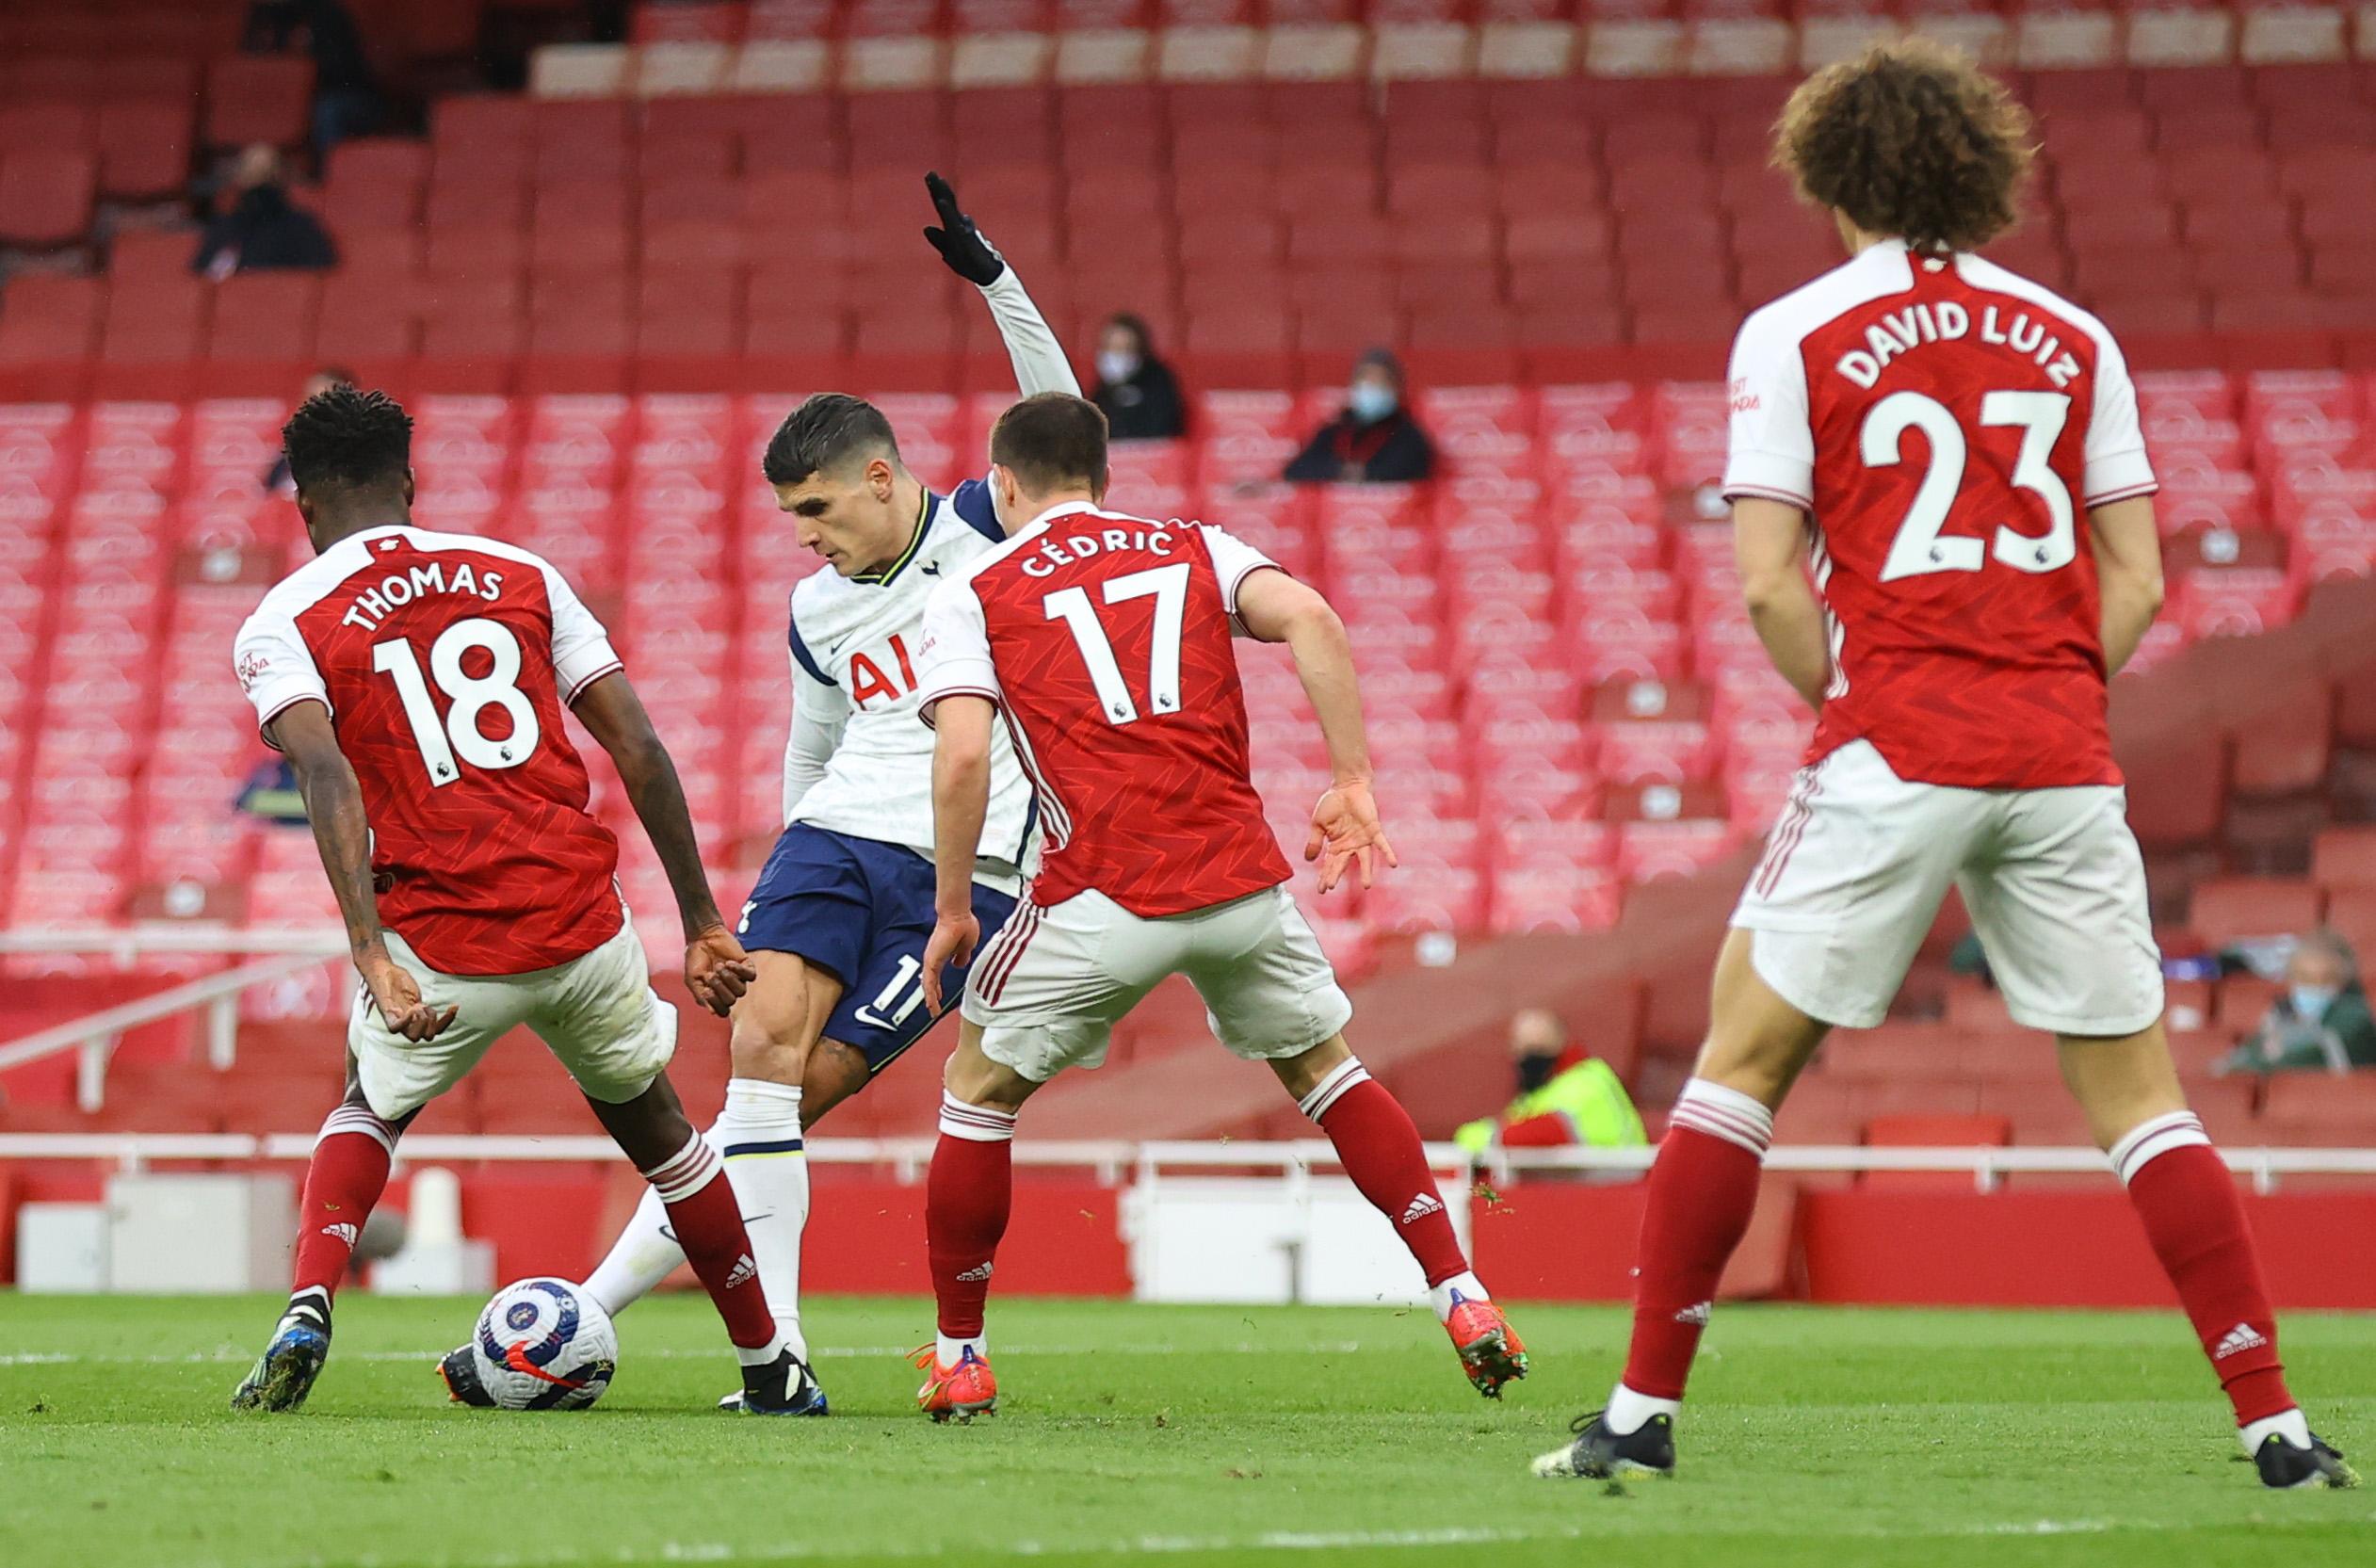 Premier League: «Μυθικό» γκολ του Λαμέλα με «ραμπόνα» κόντρα στην Άρσεναλ (videos)